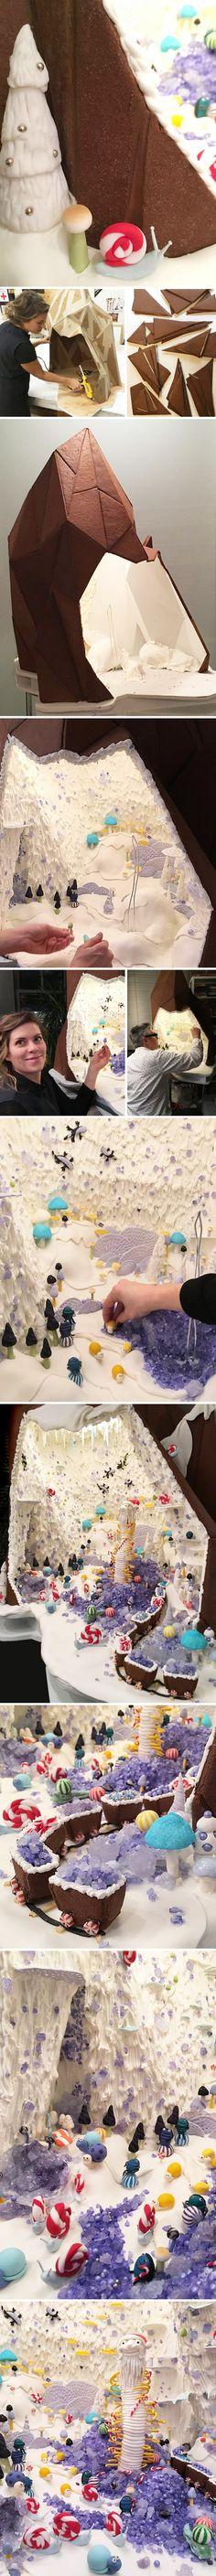 """sugar mountain"" gingerbread creation by artists ben skinner & genevieve dionne ?!?"